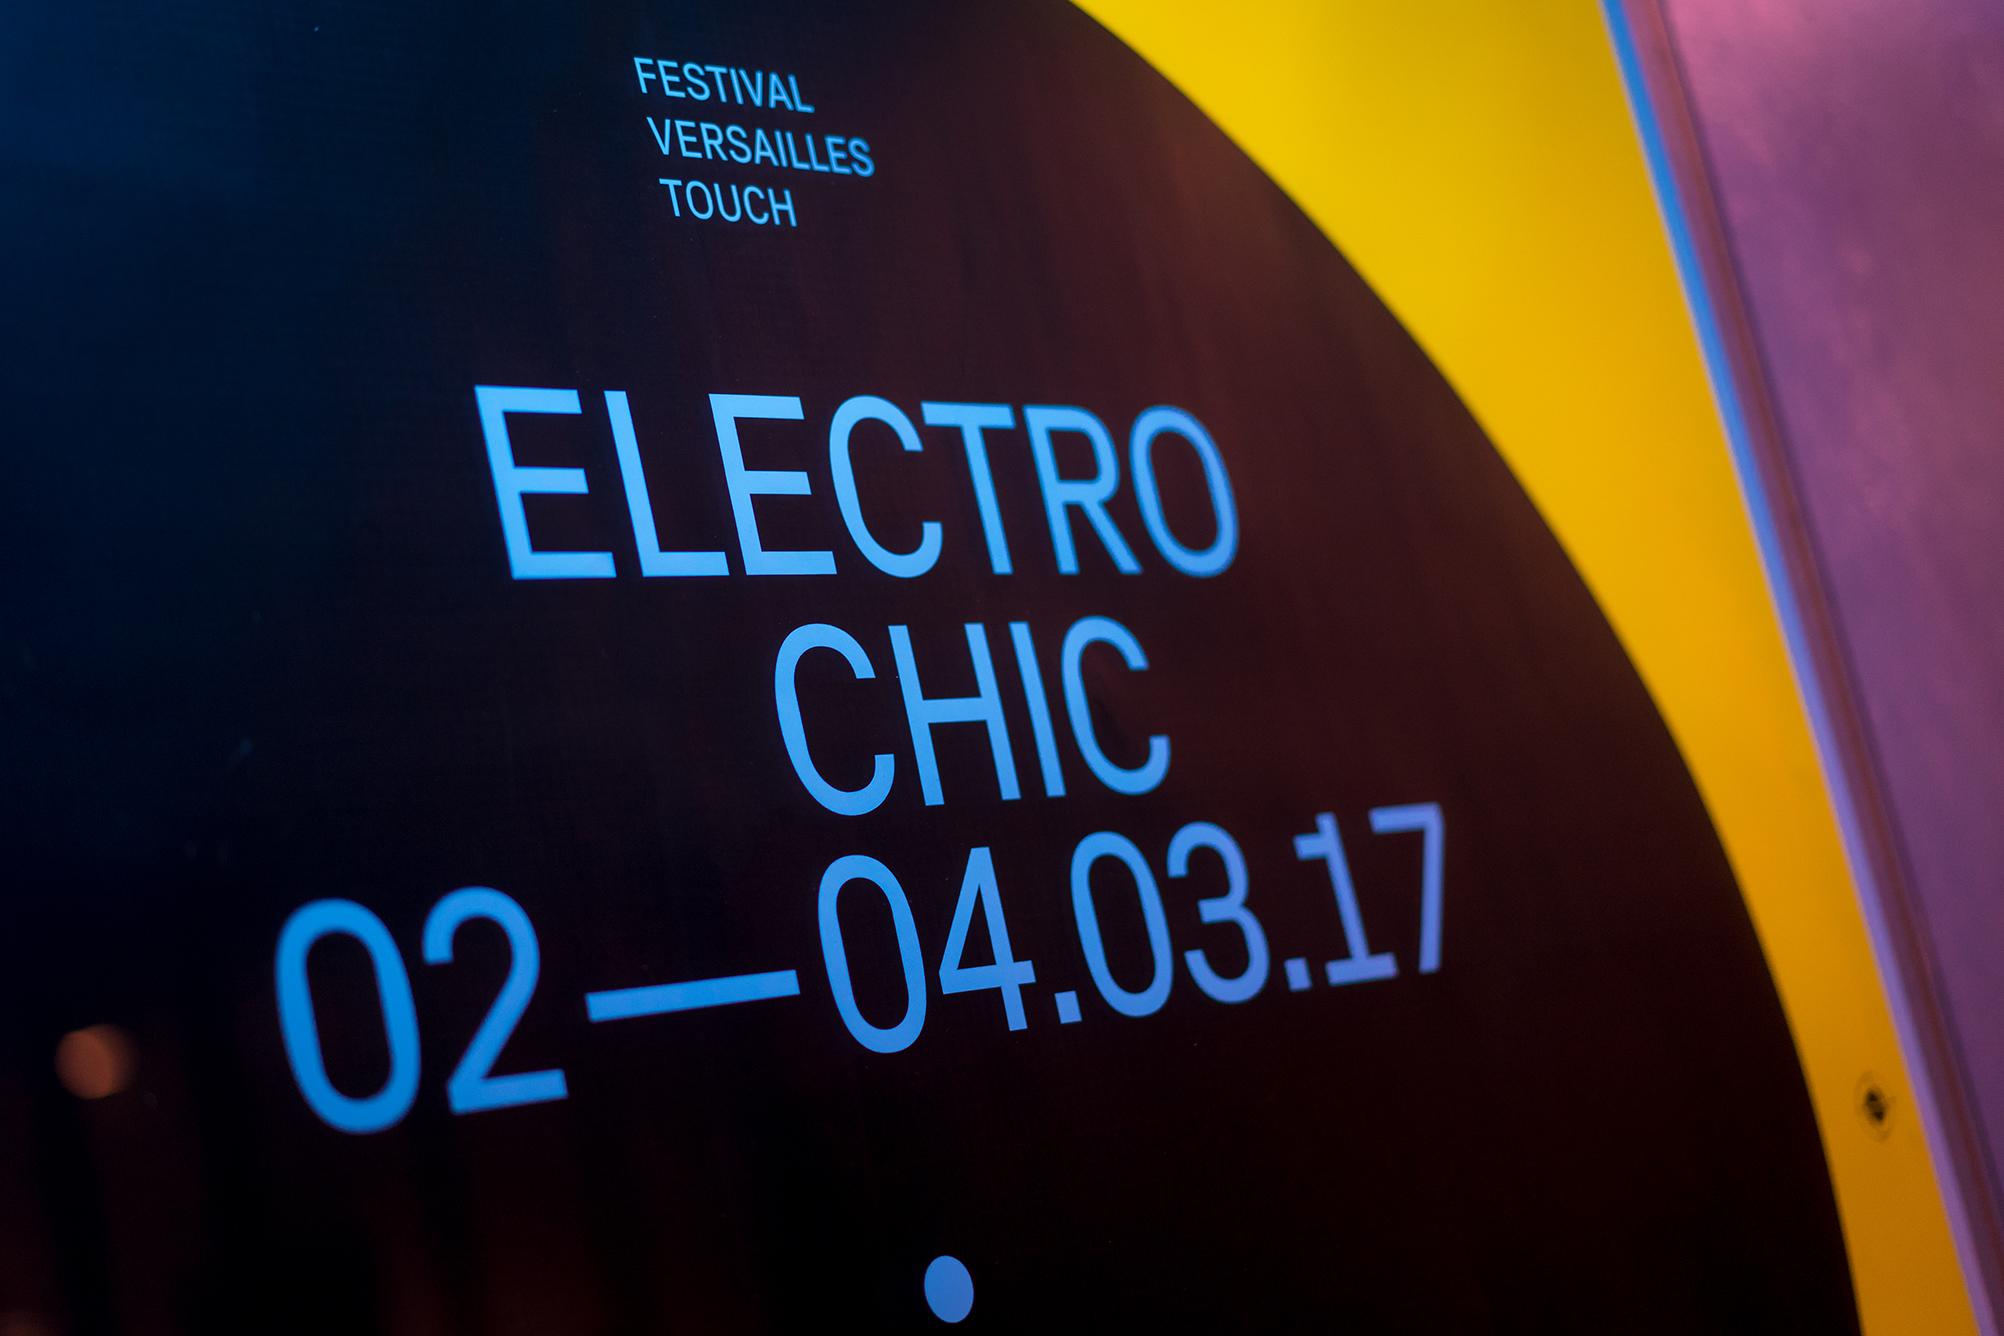 electrochic festival 2 mars 2017 photos @alexisjacq1-02039_web.jpg